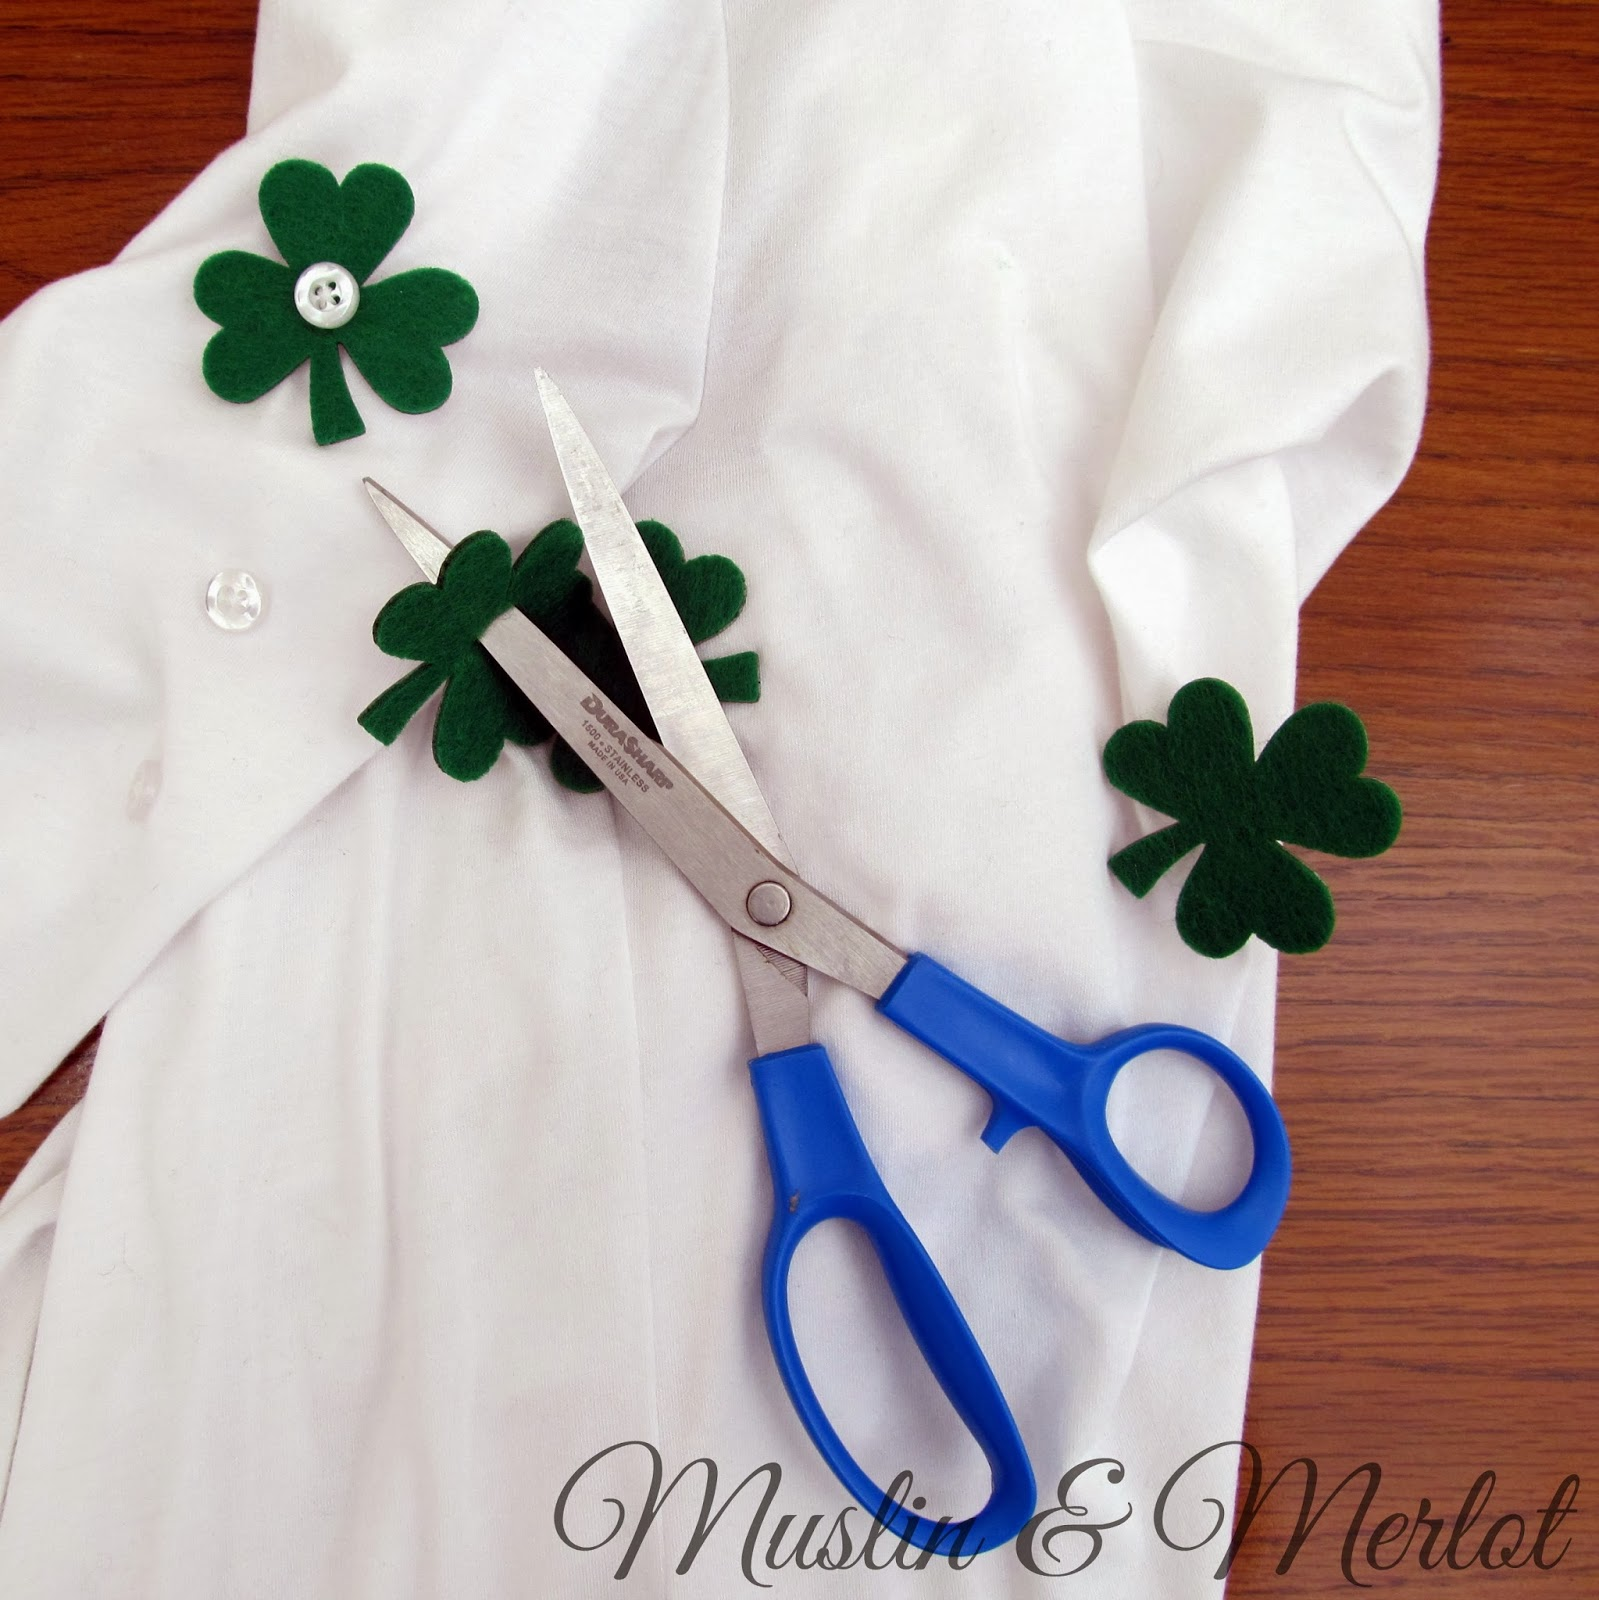 Add shamrocks to your shirt sleeves! by Muslin & Merlot